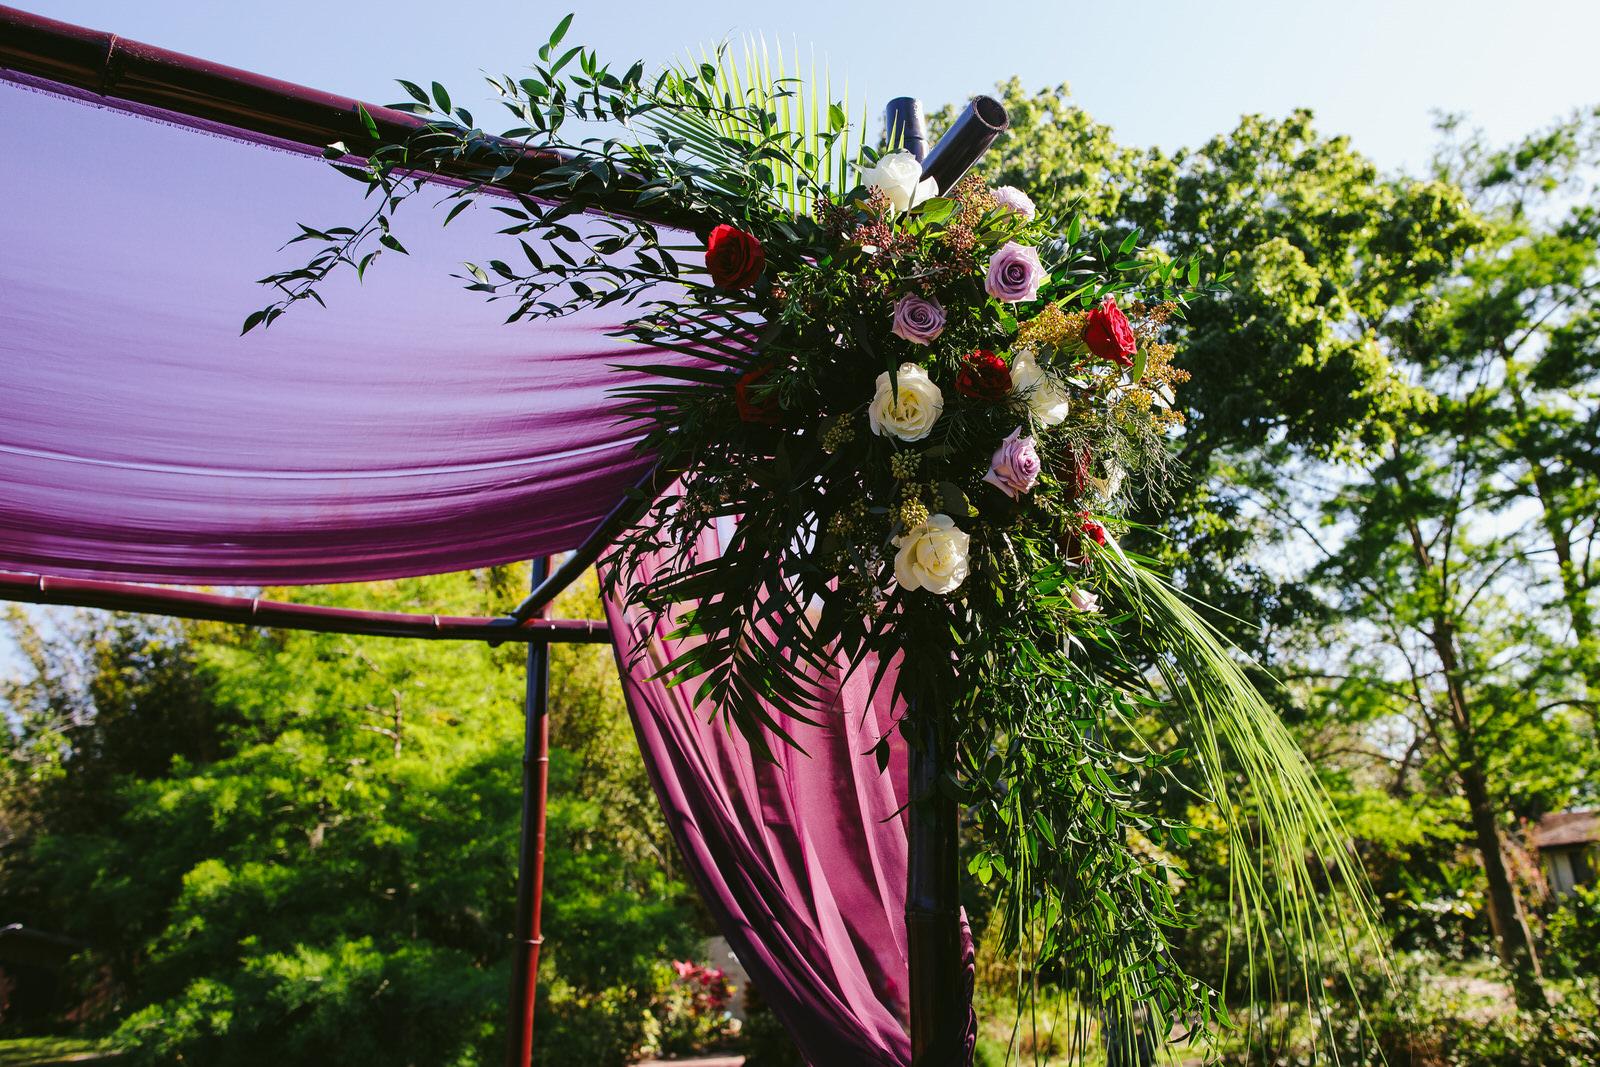 kashi-ashram-wedding-sebastian-florida-tiny-house-photo.jpg